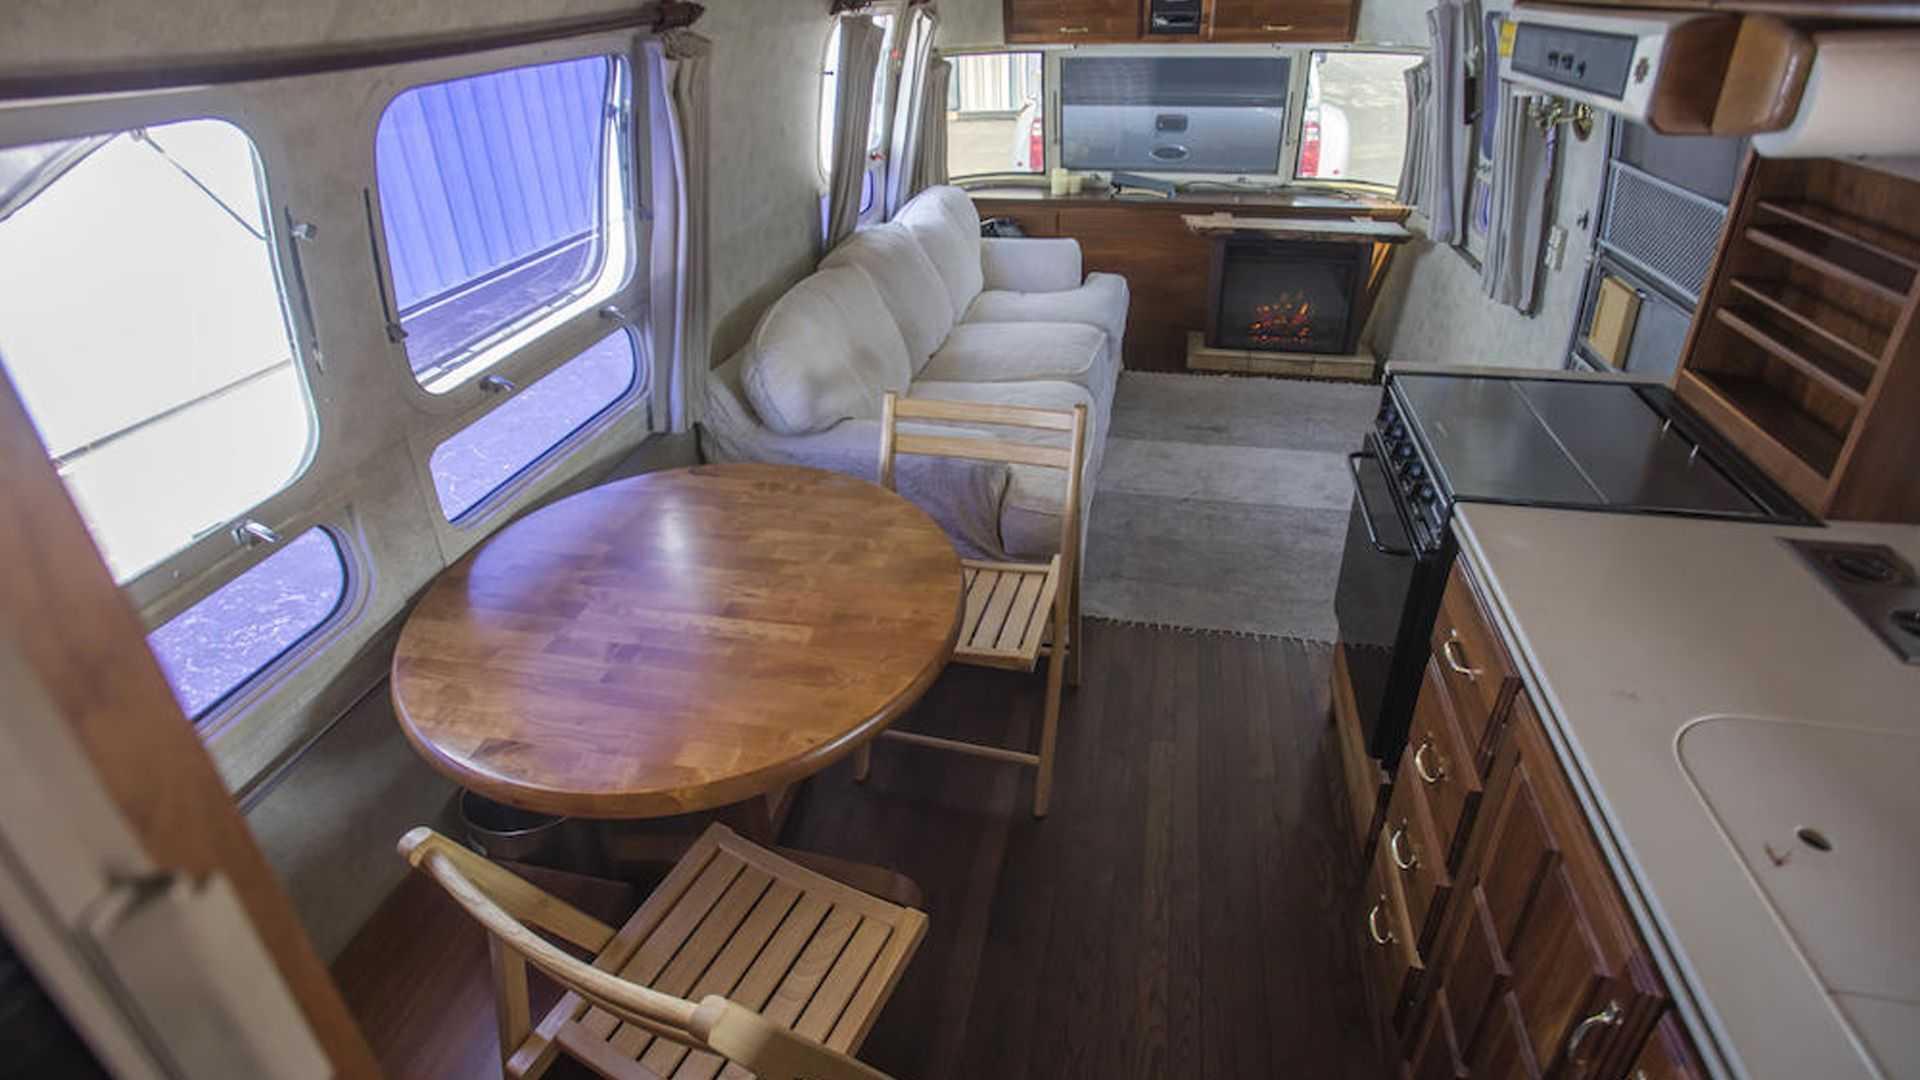 Tom-Hanks-Airstream-trailer-for-sale-12